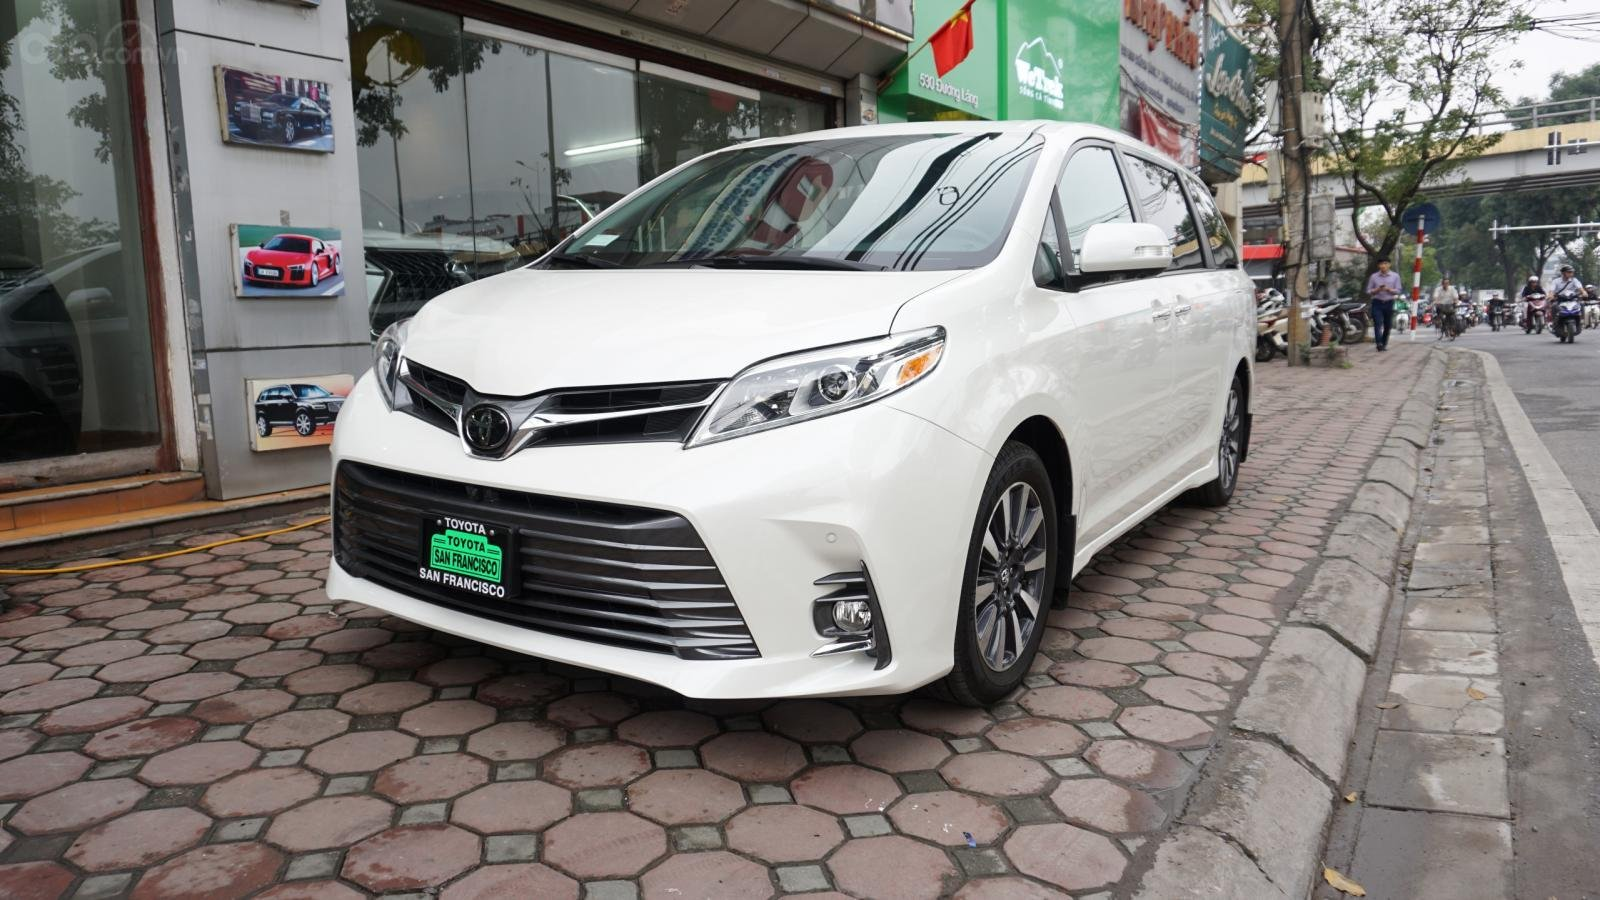 Bán xe Toyota Sienna Le Limited sản xuất 2018, nhập Mỹ - LH 0945392468-1